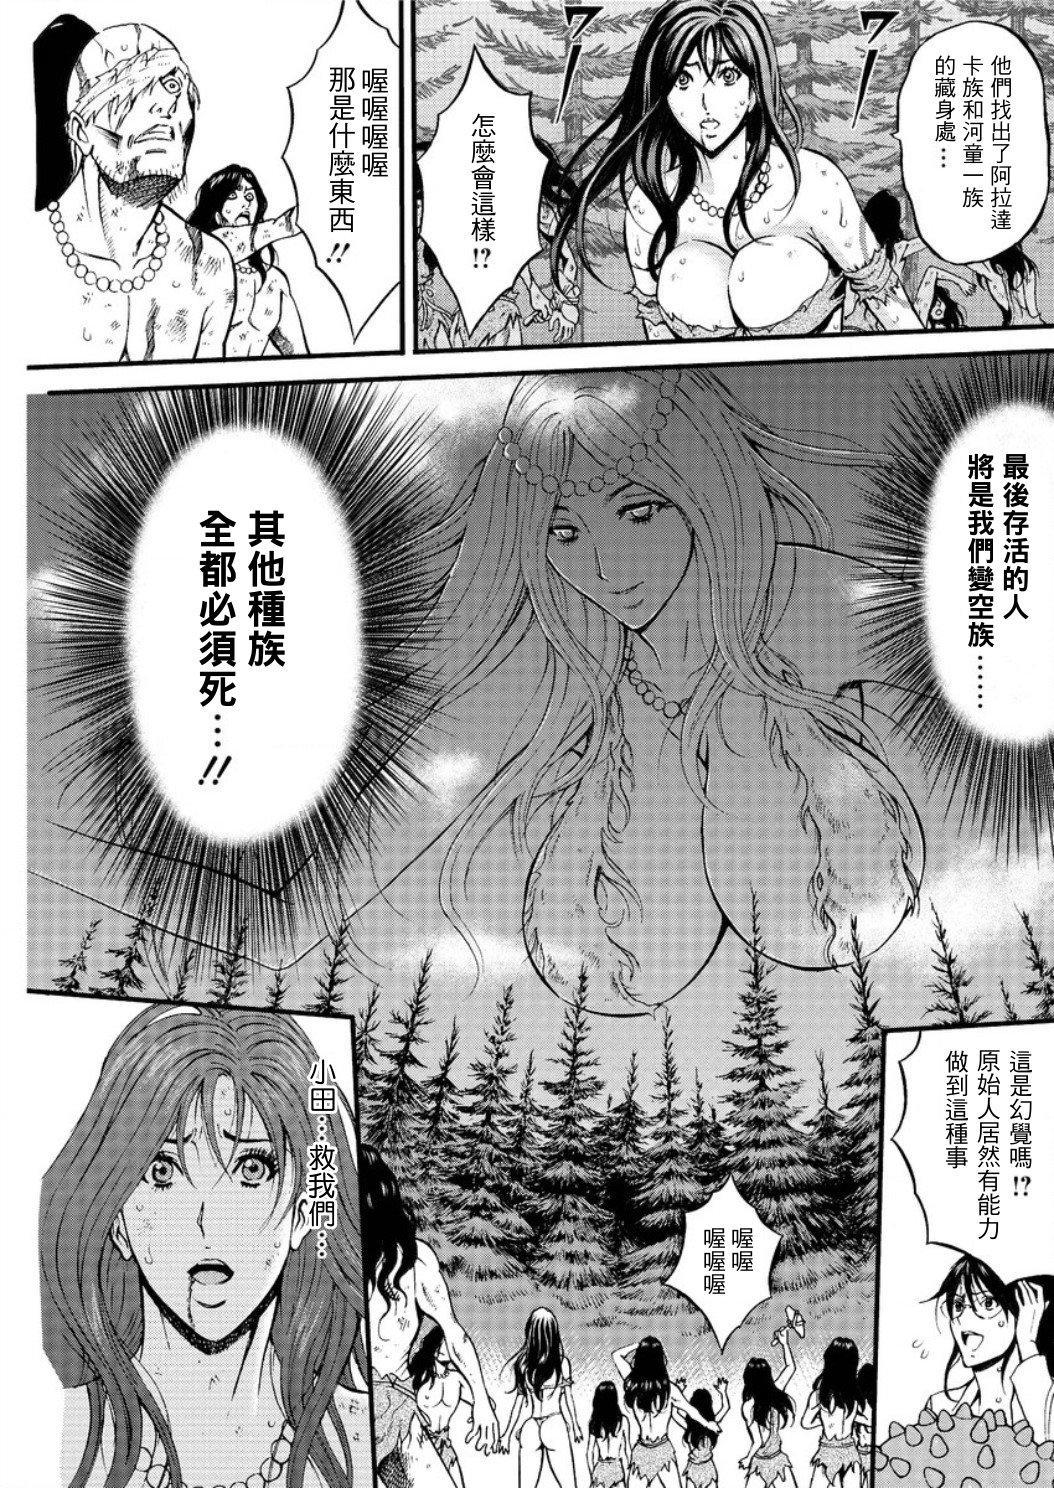 Kigenzen 10000 Nen no Ota | 史前一萬年的宅男 Ch. 19-24 81